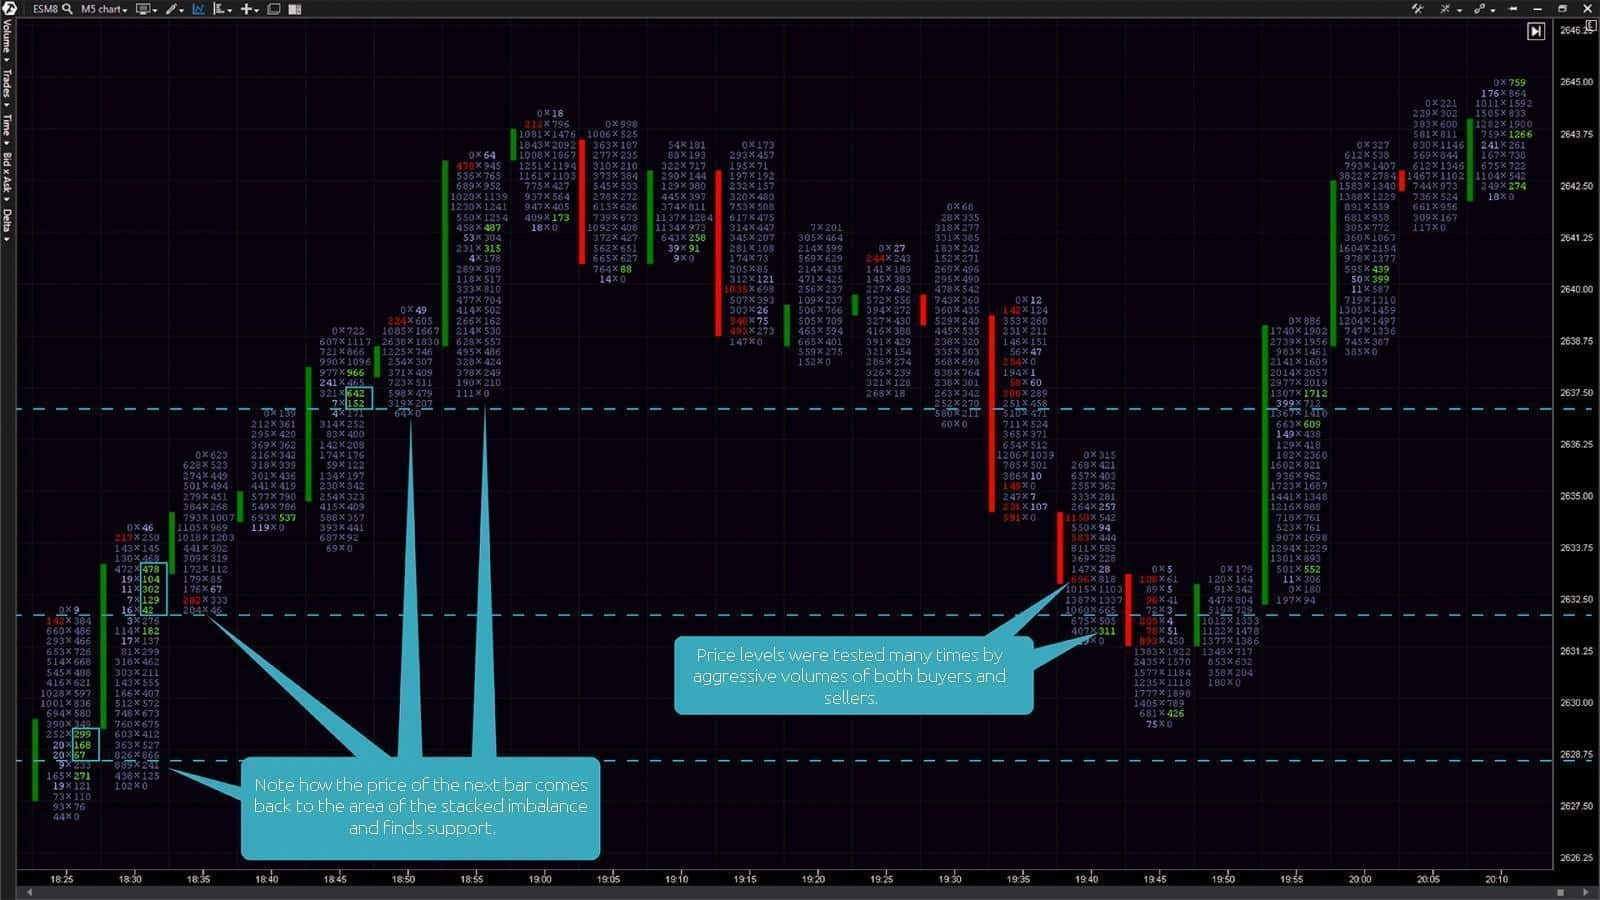 5-minute chart of an E-mini S&P 500 futures. Bid x Ask Imbalance Footprint chart